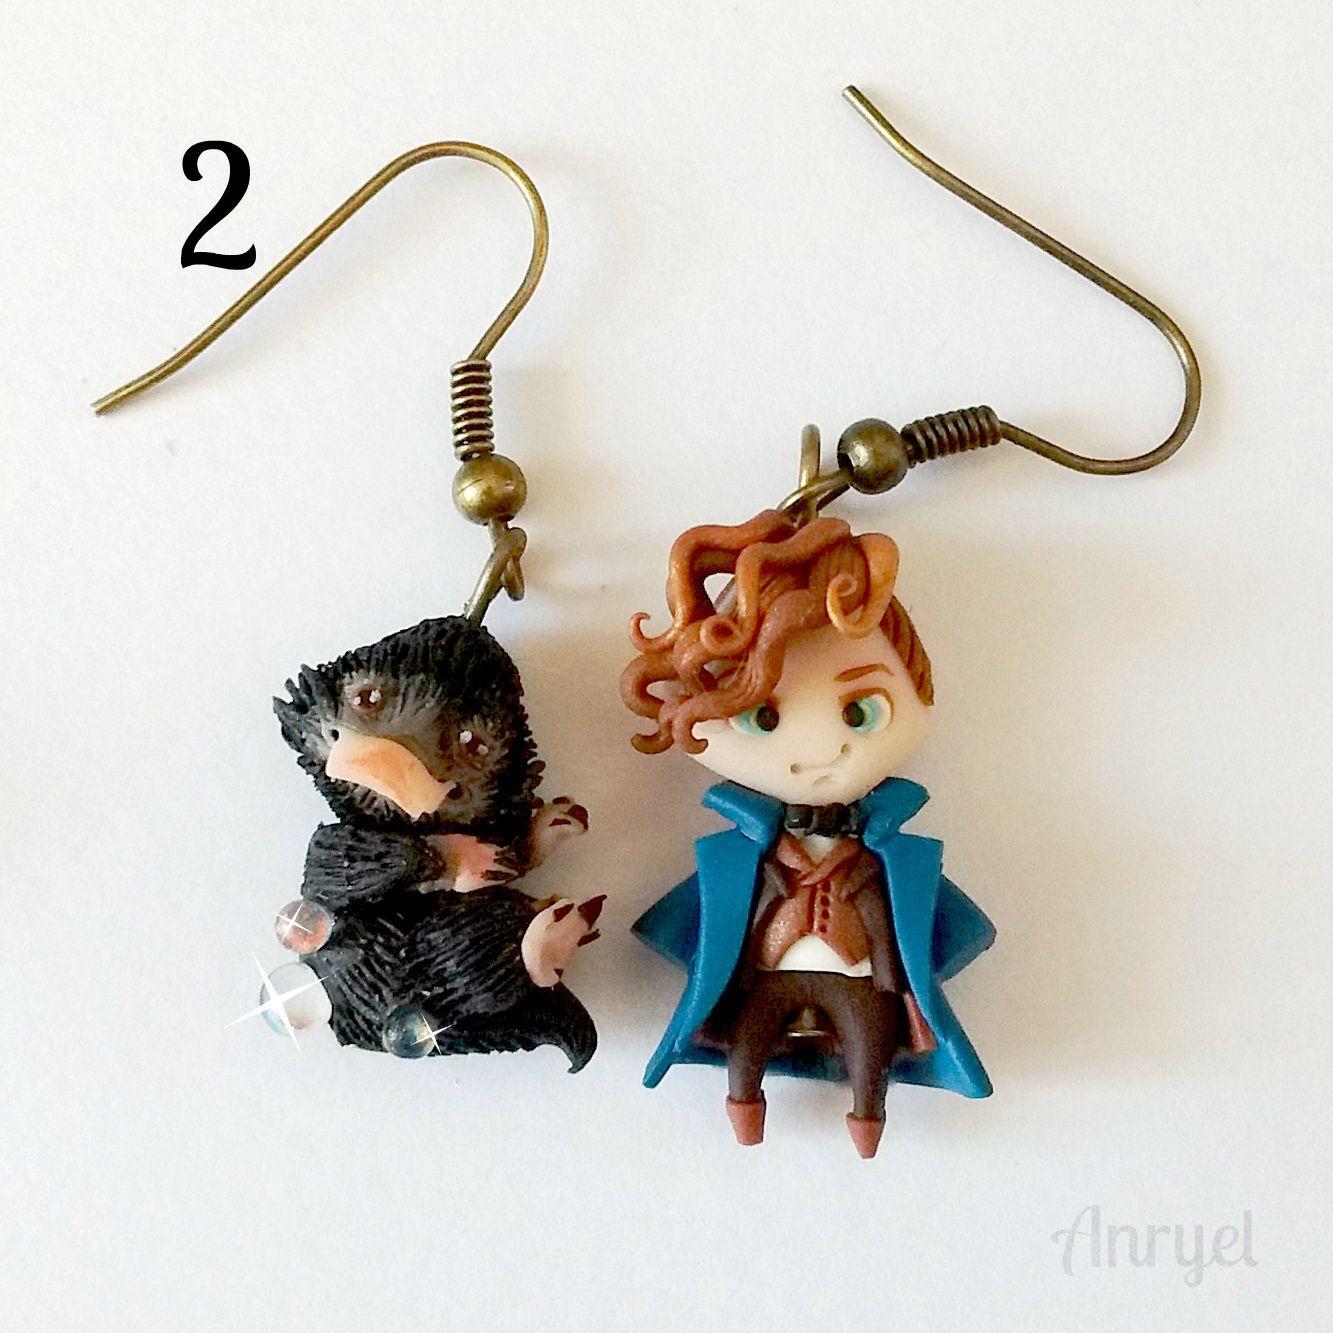 Fantastic beasts and where to find them FAN ART Niffler Newt Scamander Addicted Magic Hogwarts(Etsy のAnryelより) https://www.etsy.com/jp/listing/505422568/fantastic-beasts-and-where-to-find-them